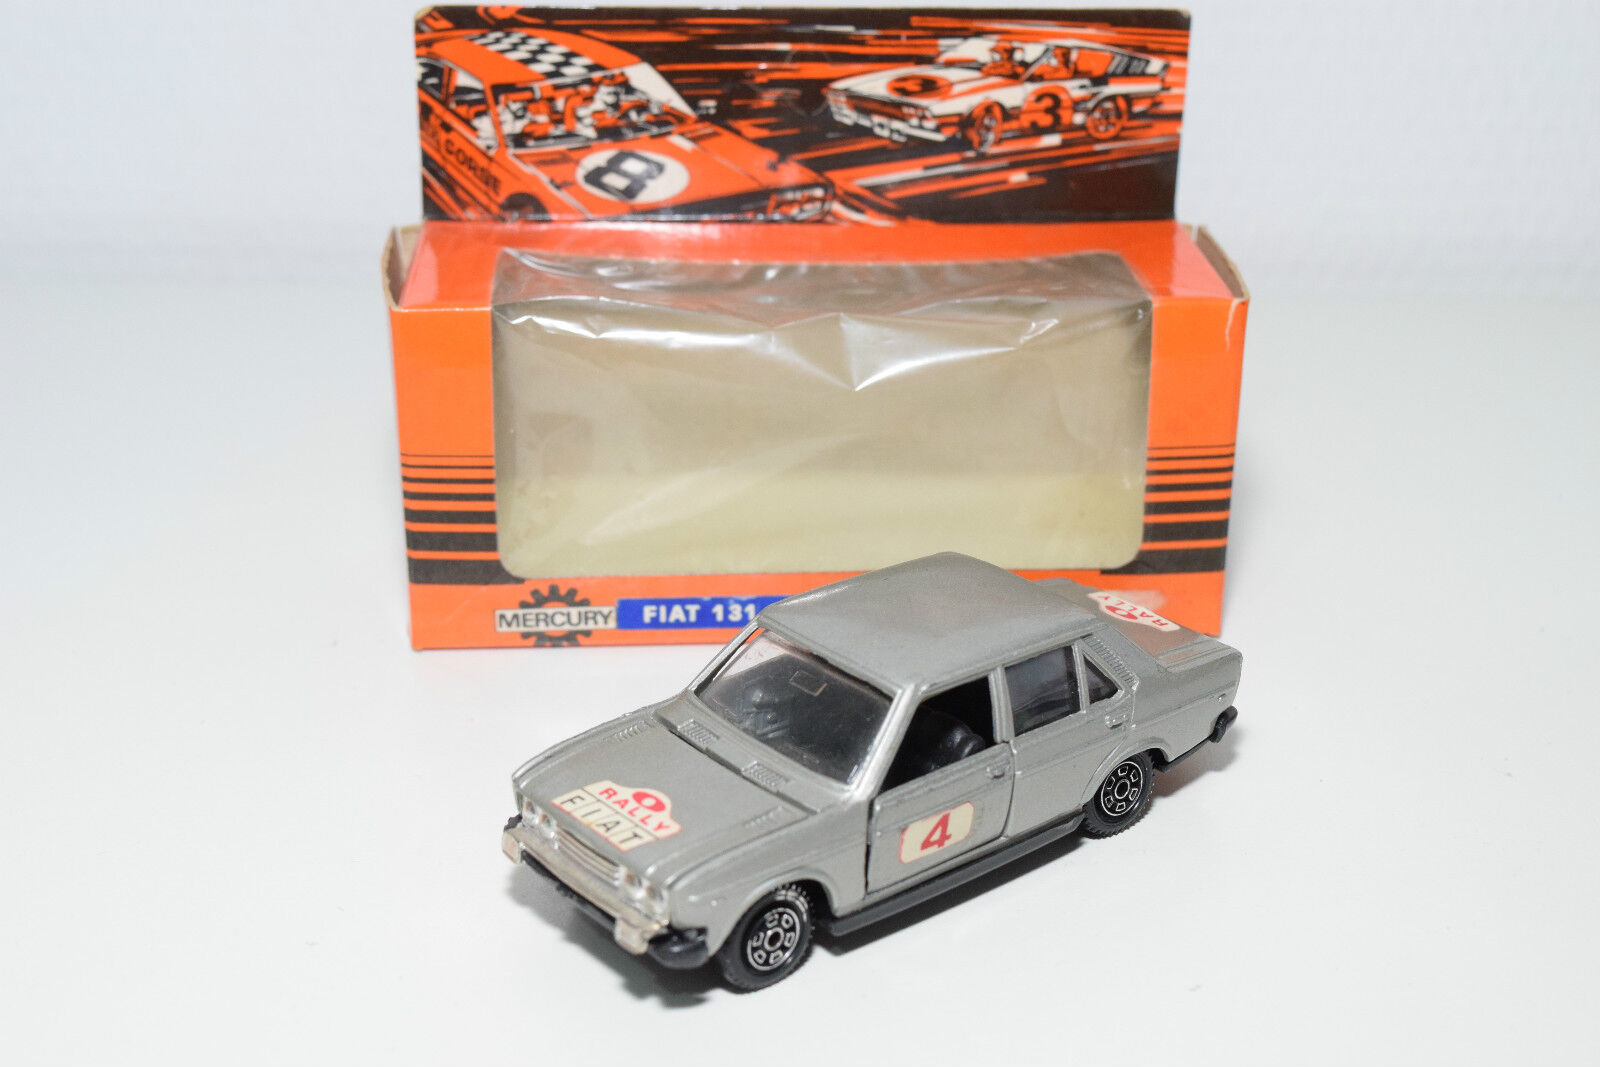 MERCURY 1 FIAT 131 MIRAFIORI RALLY METALLIC gris NEAR MINT BOXED RARE SELTEN